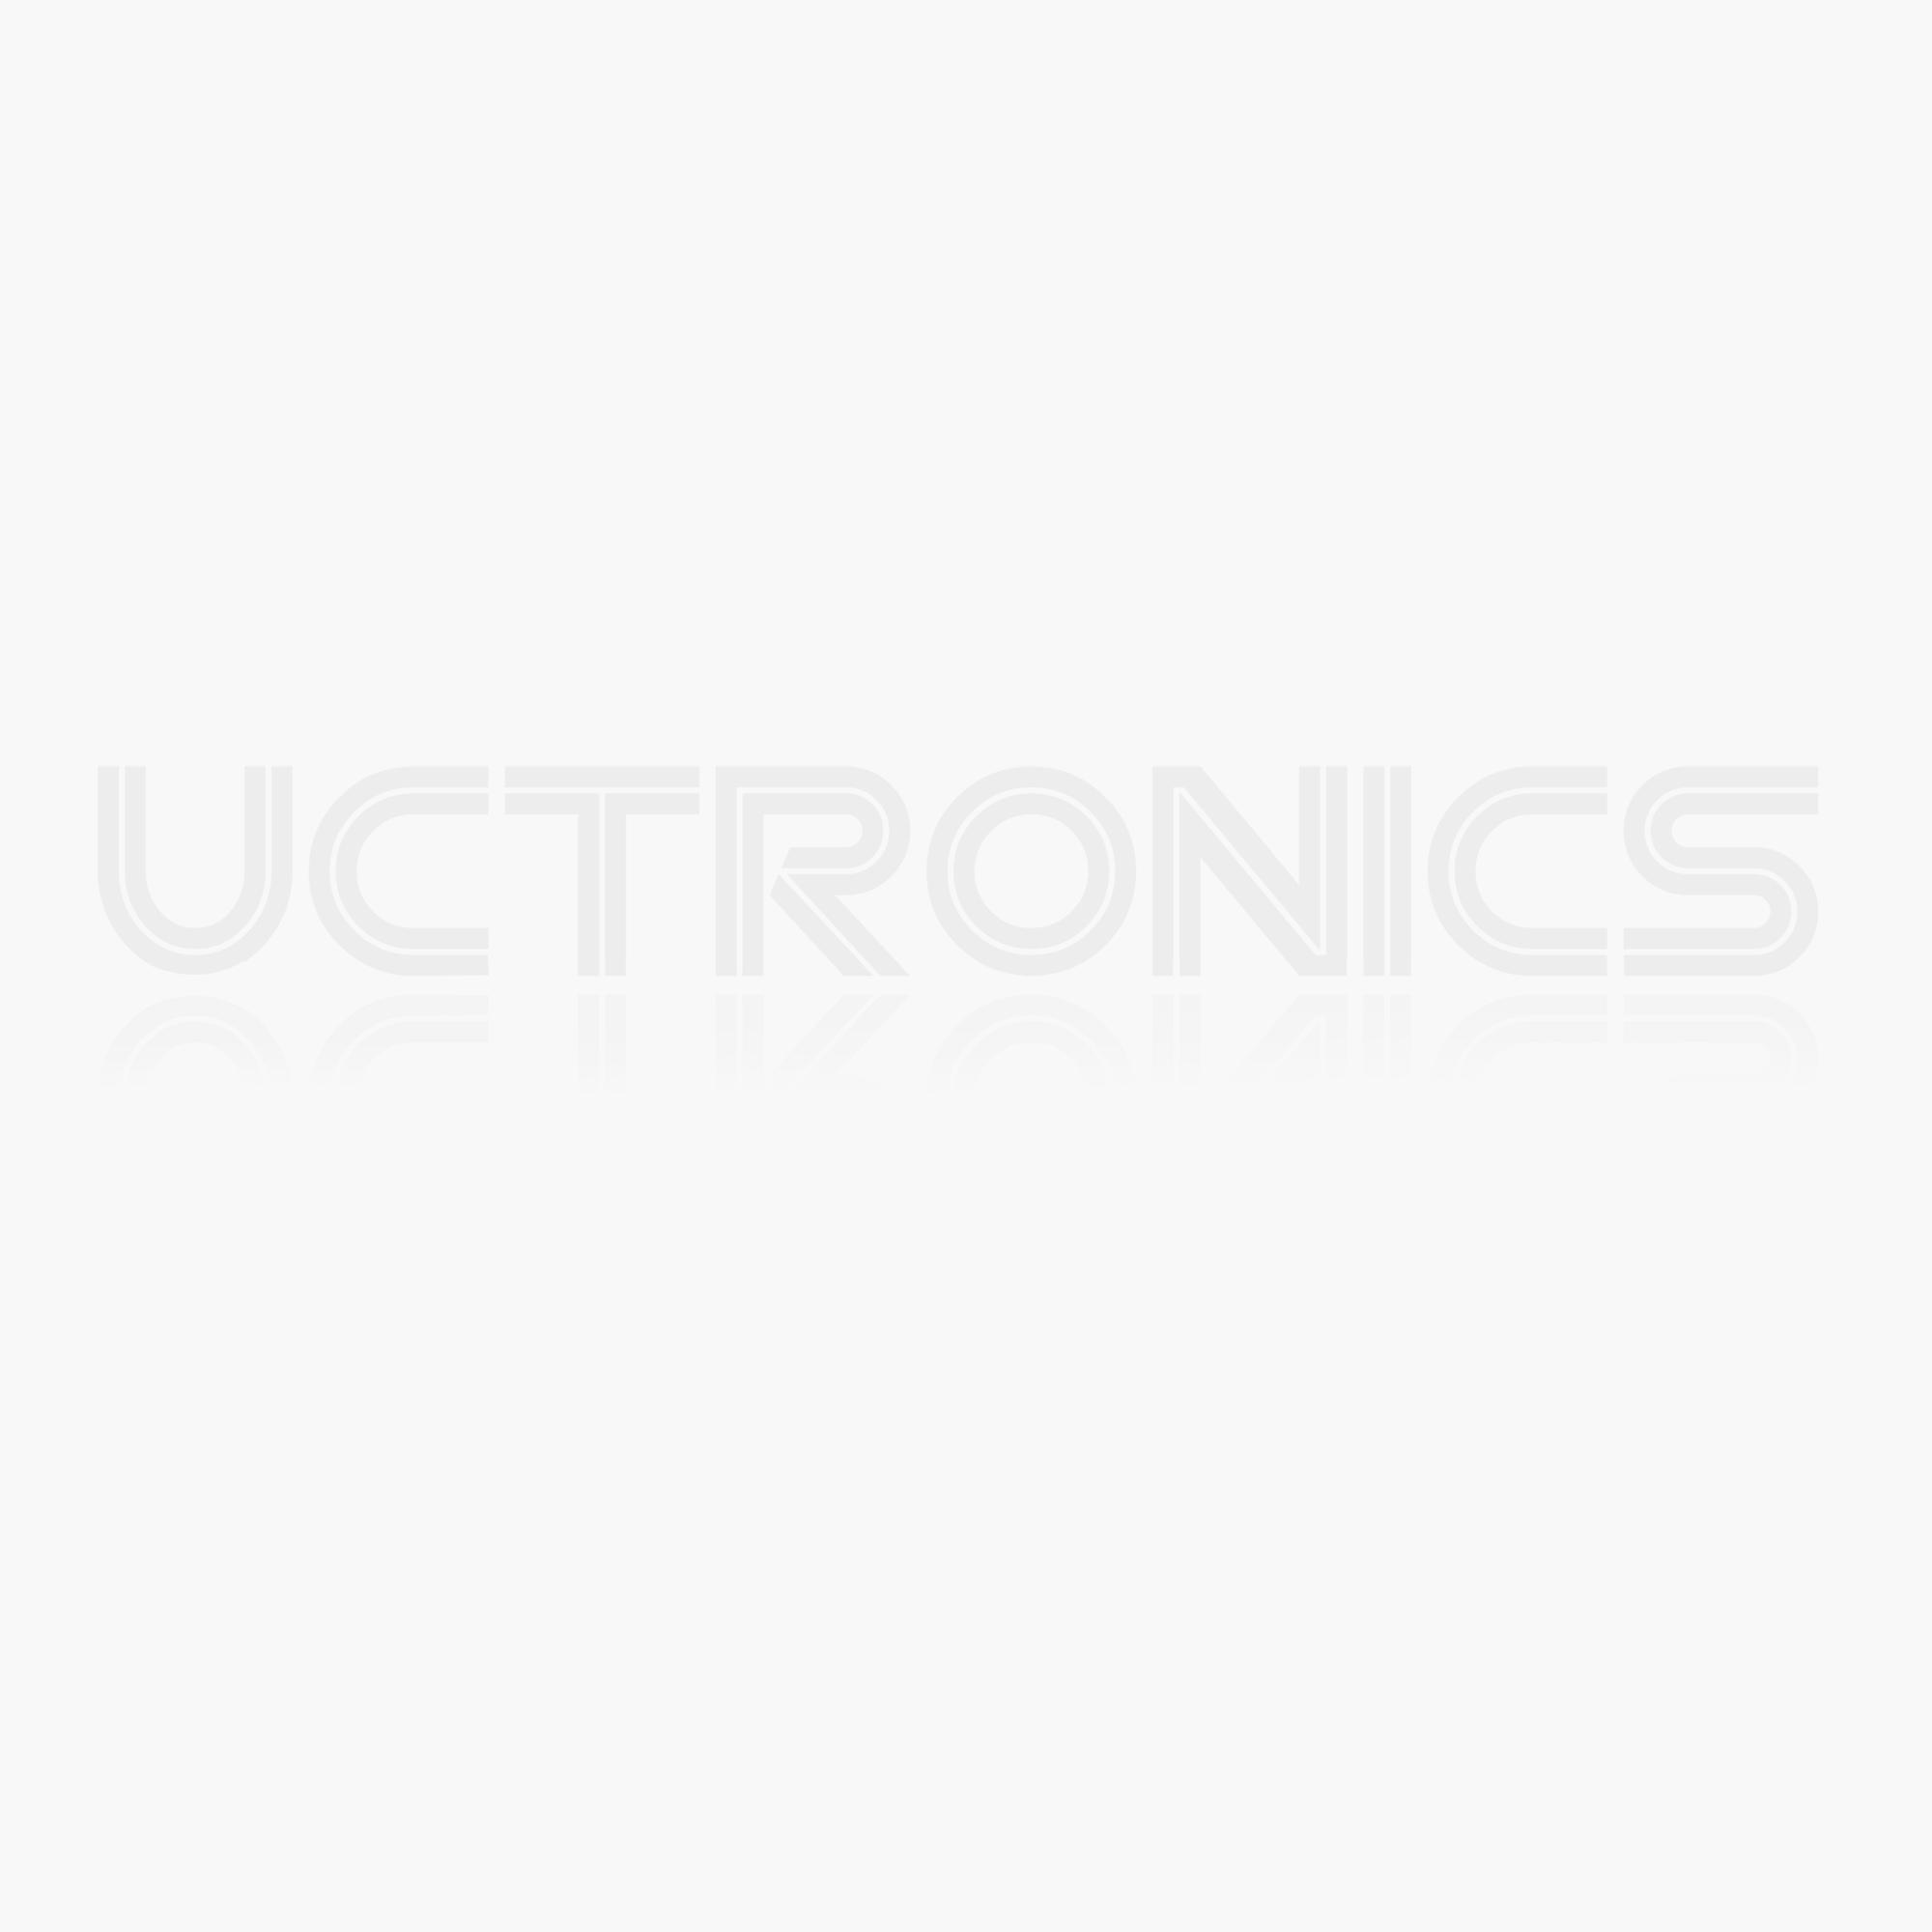 Photoresistor light Sensor Module for Smart Car#002